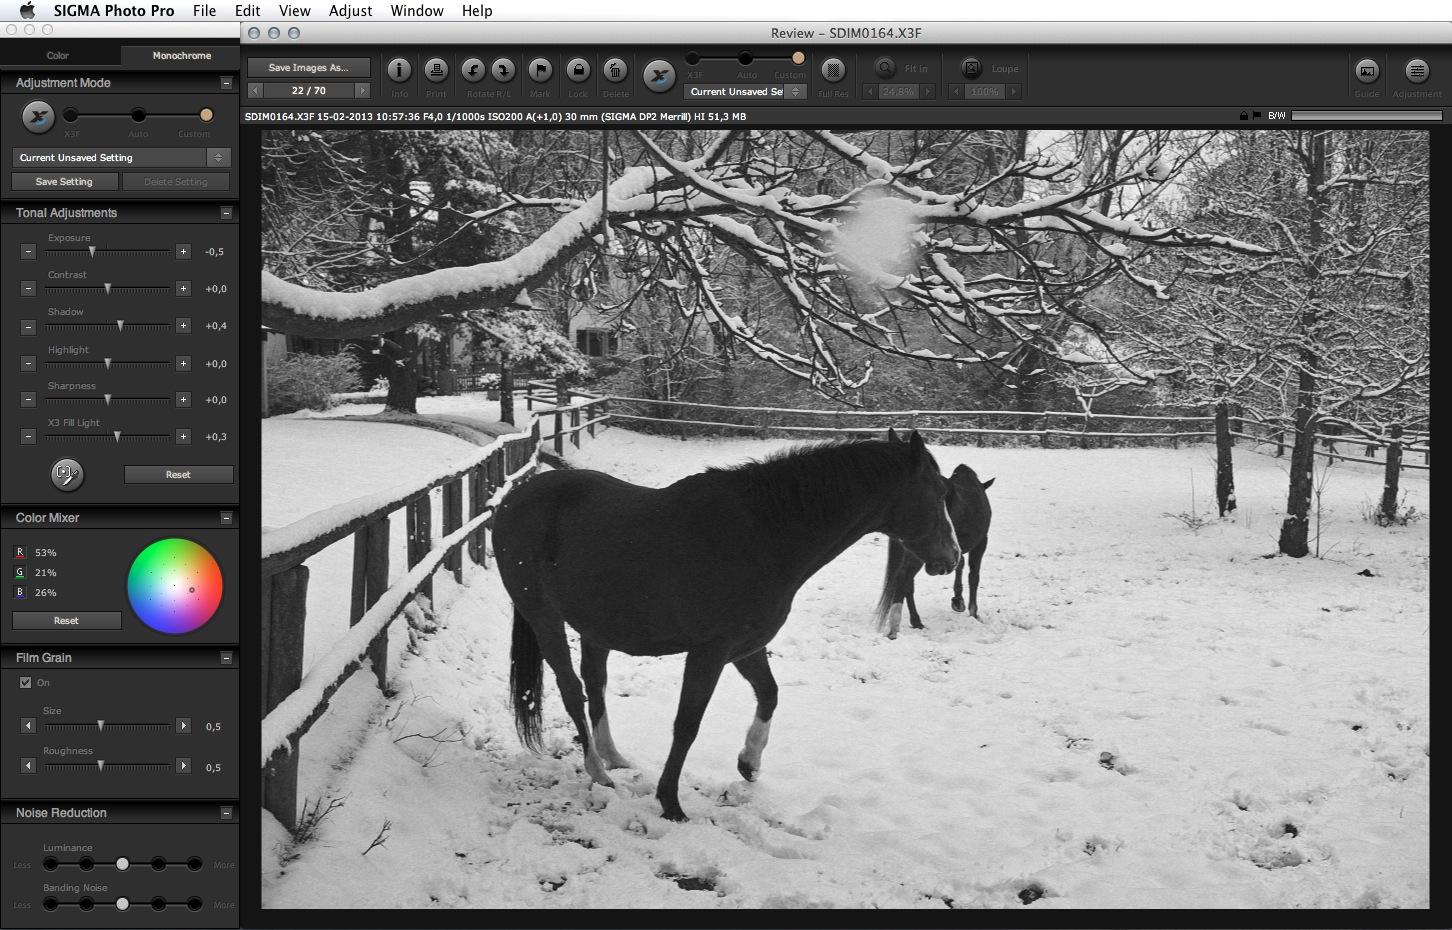 Sigma Photo Pro 5.5 monochrome